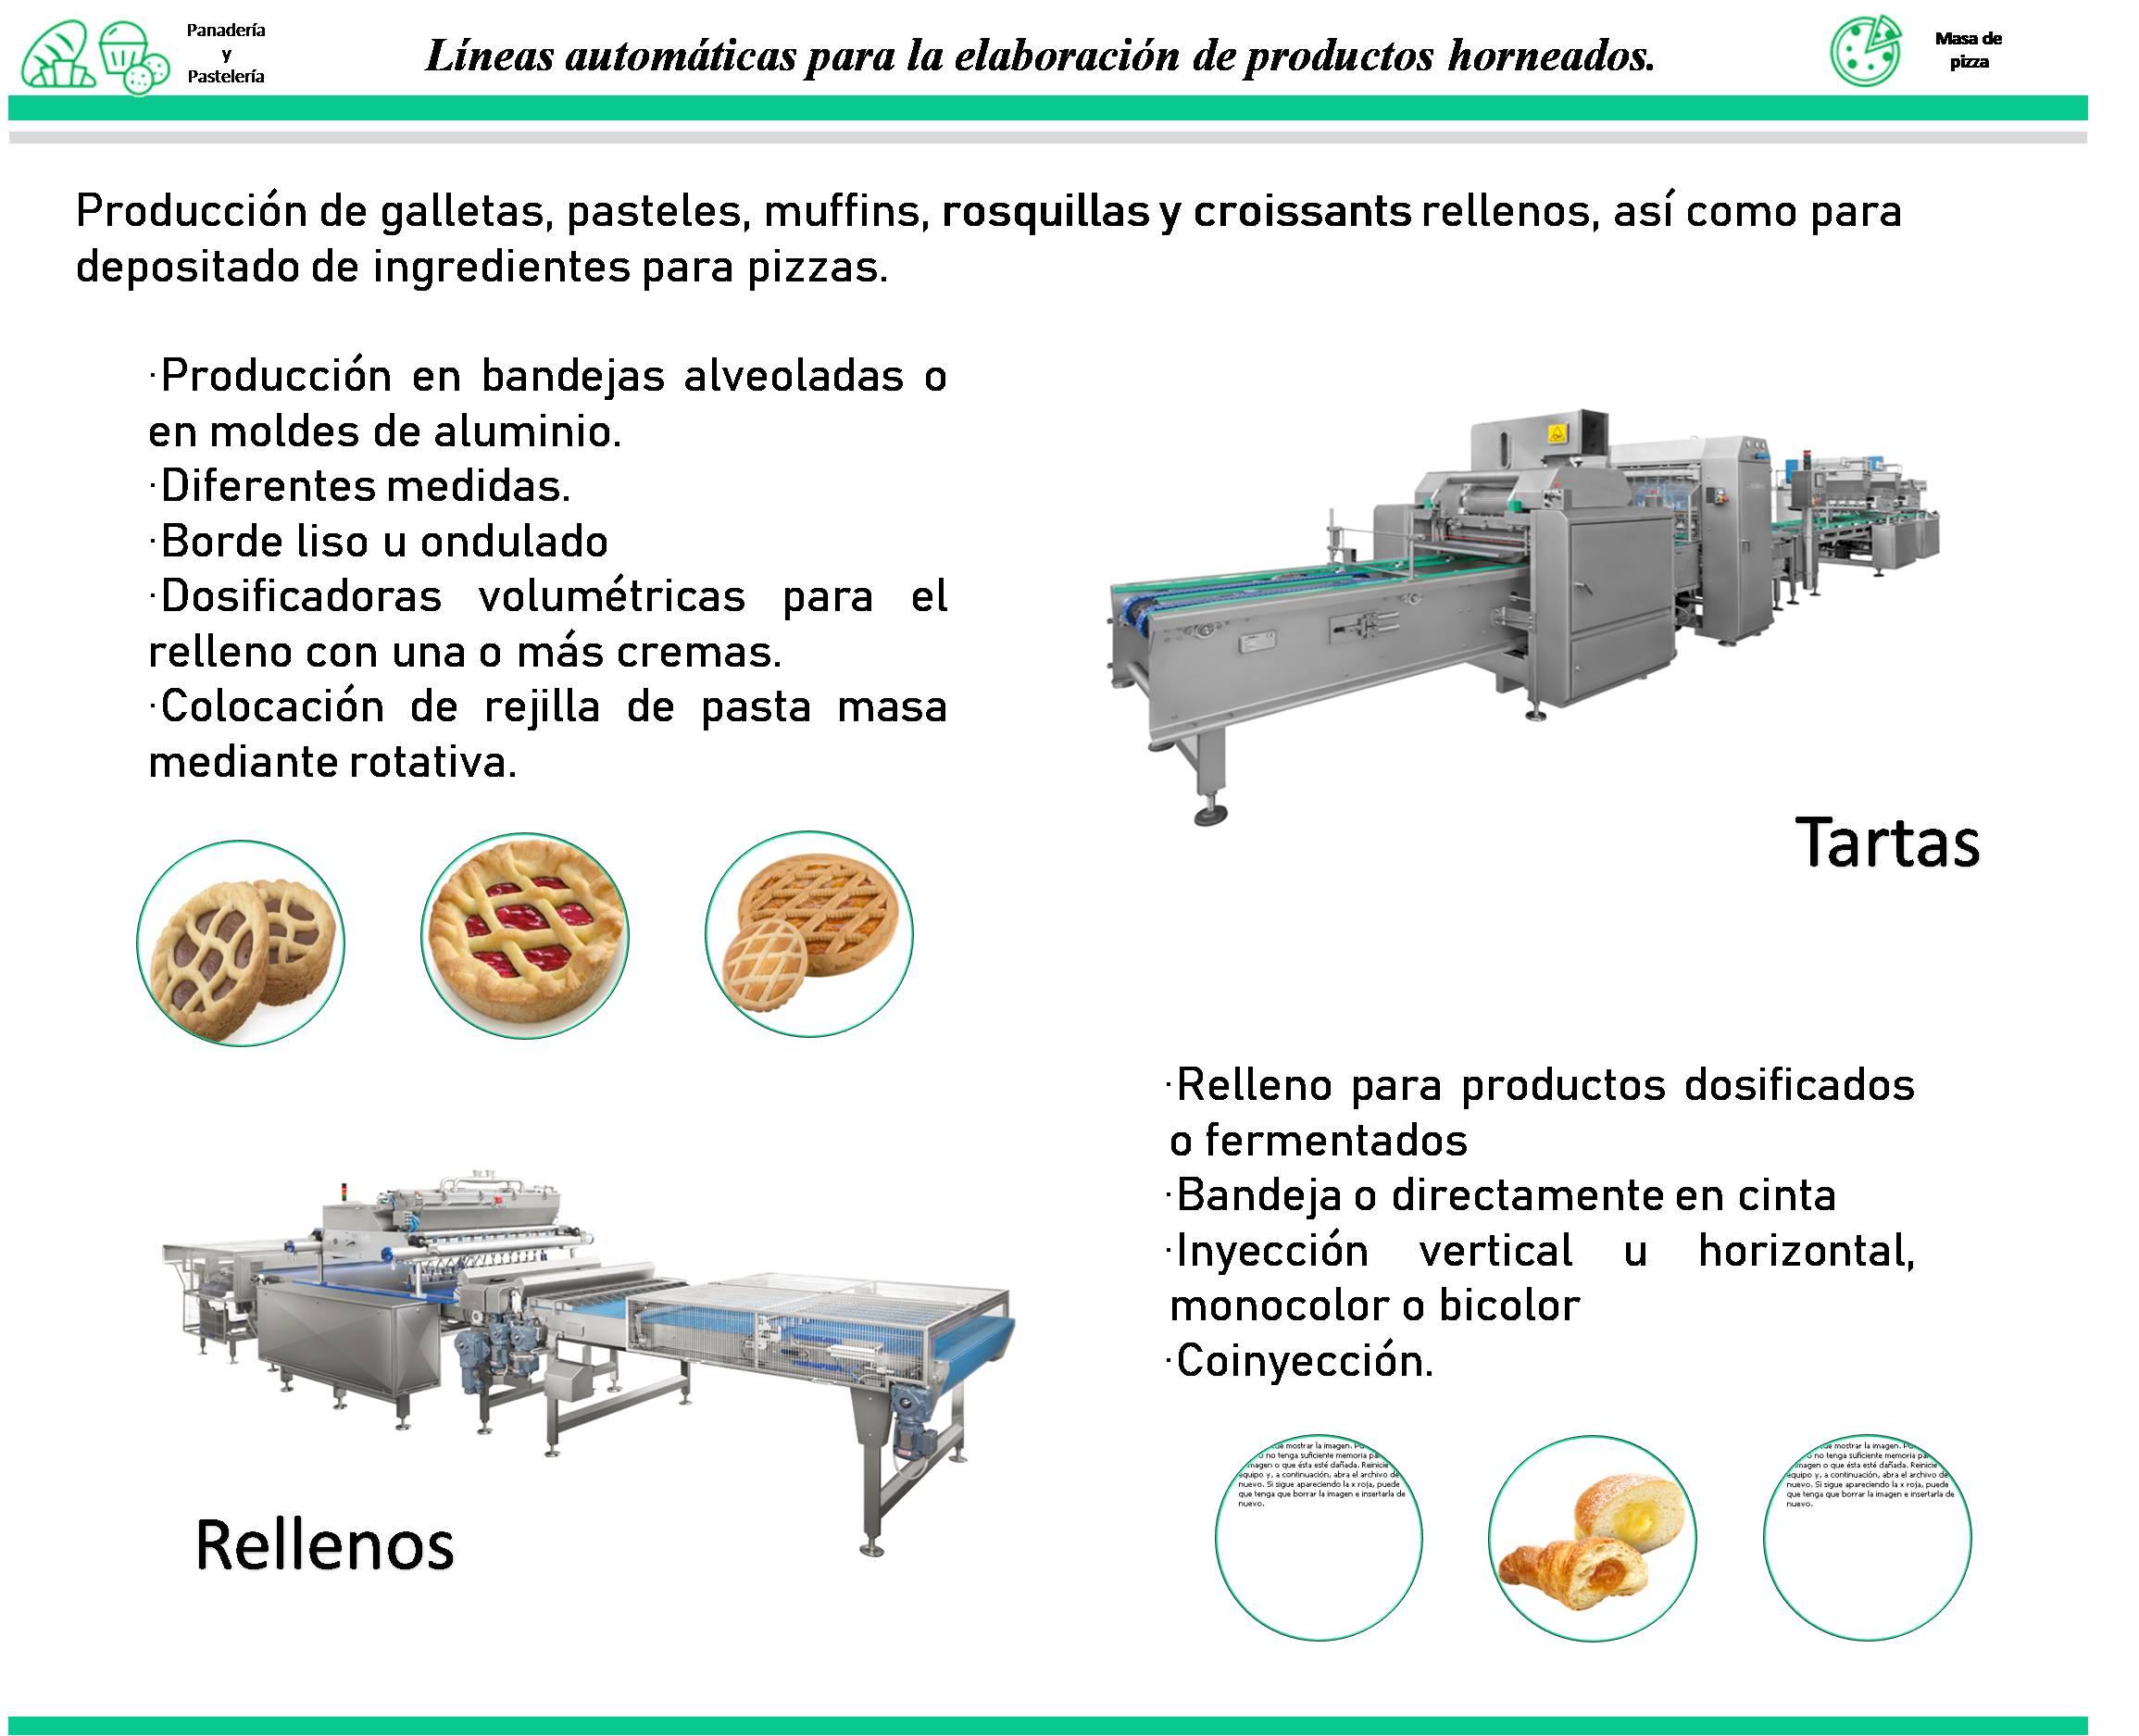 https://0201.nccdn.net/1_2/000/000/0b3/f33/bakery-lineas.jpg